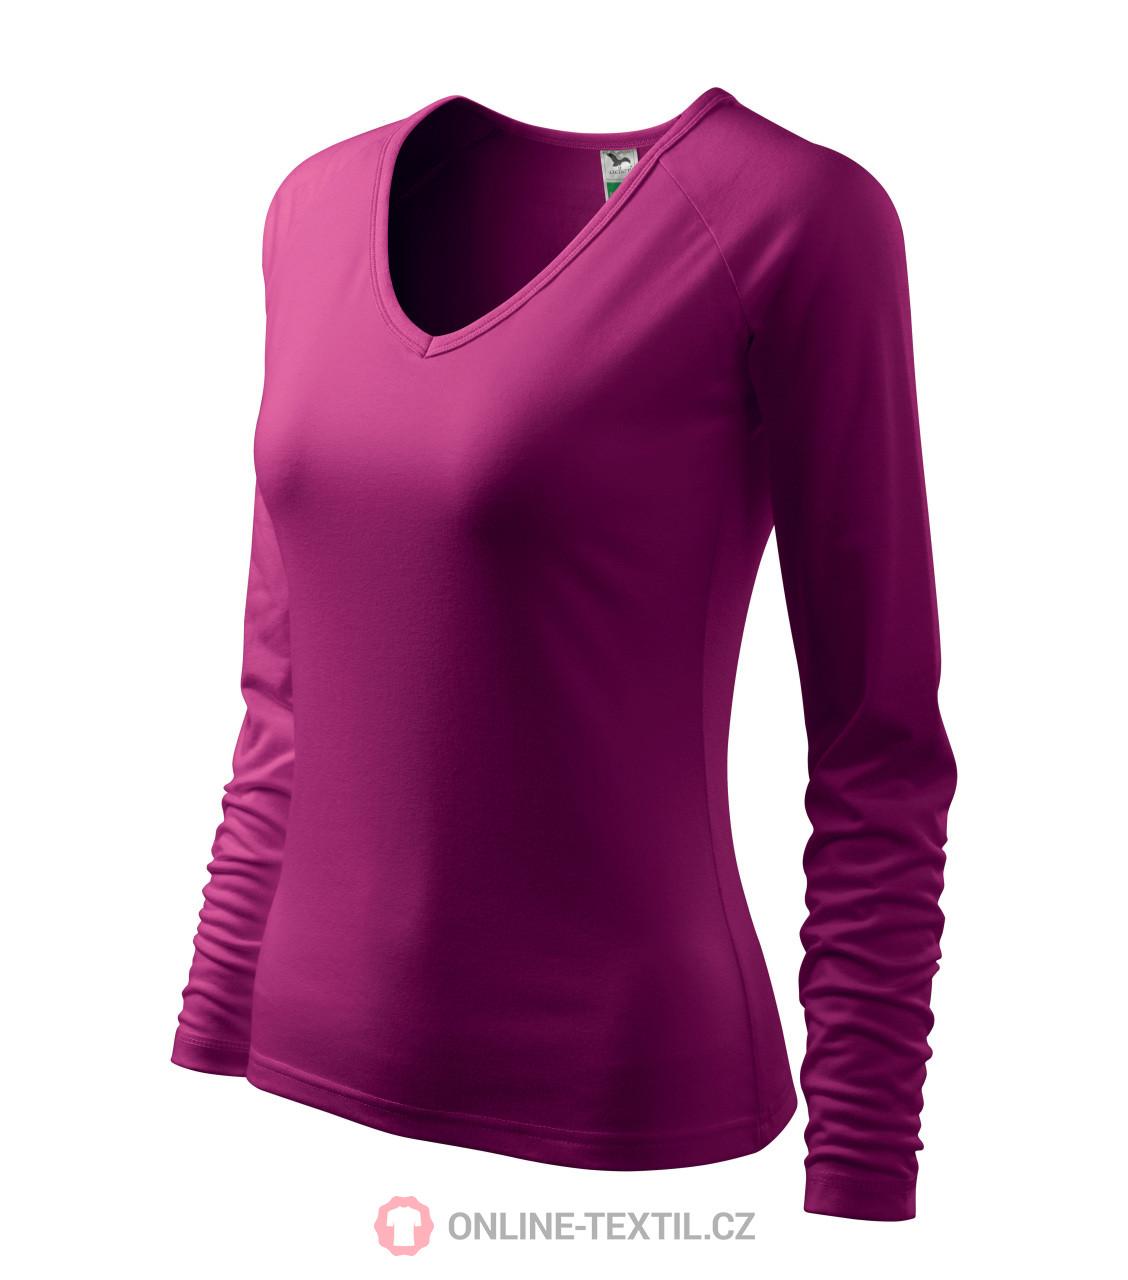 4212b2428 ADLER CZECH Elegance tričko dámske A27 - fuchsiová z kolekcie ...